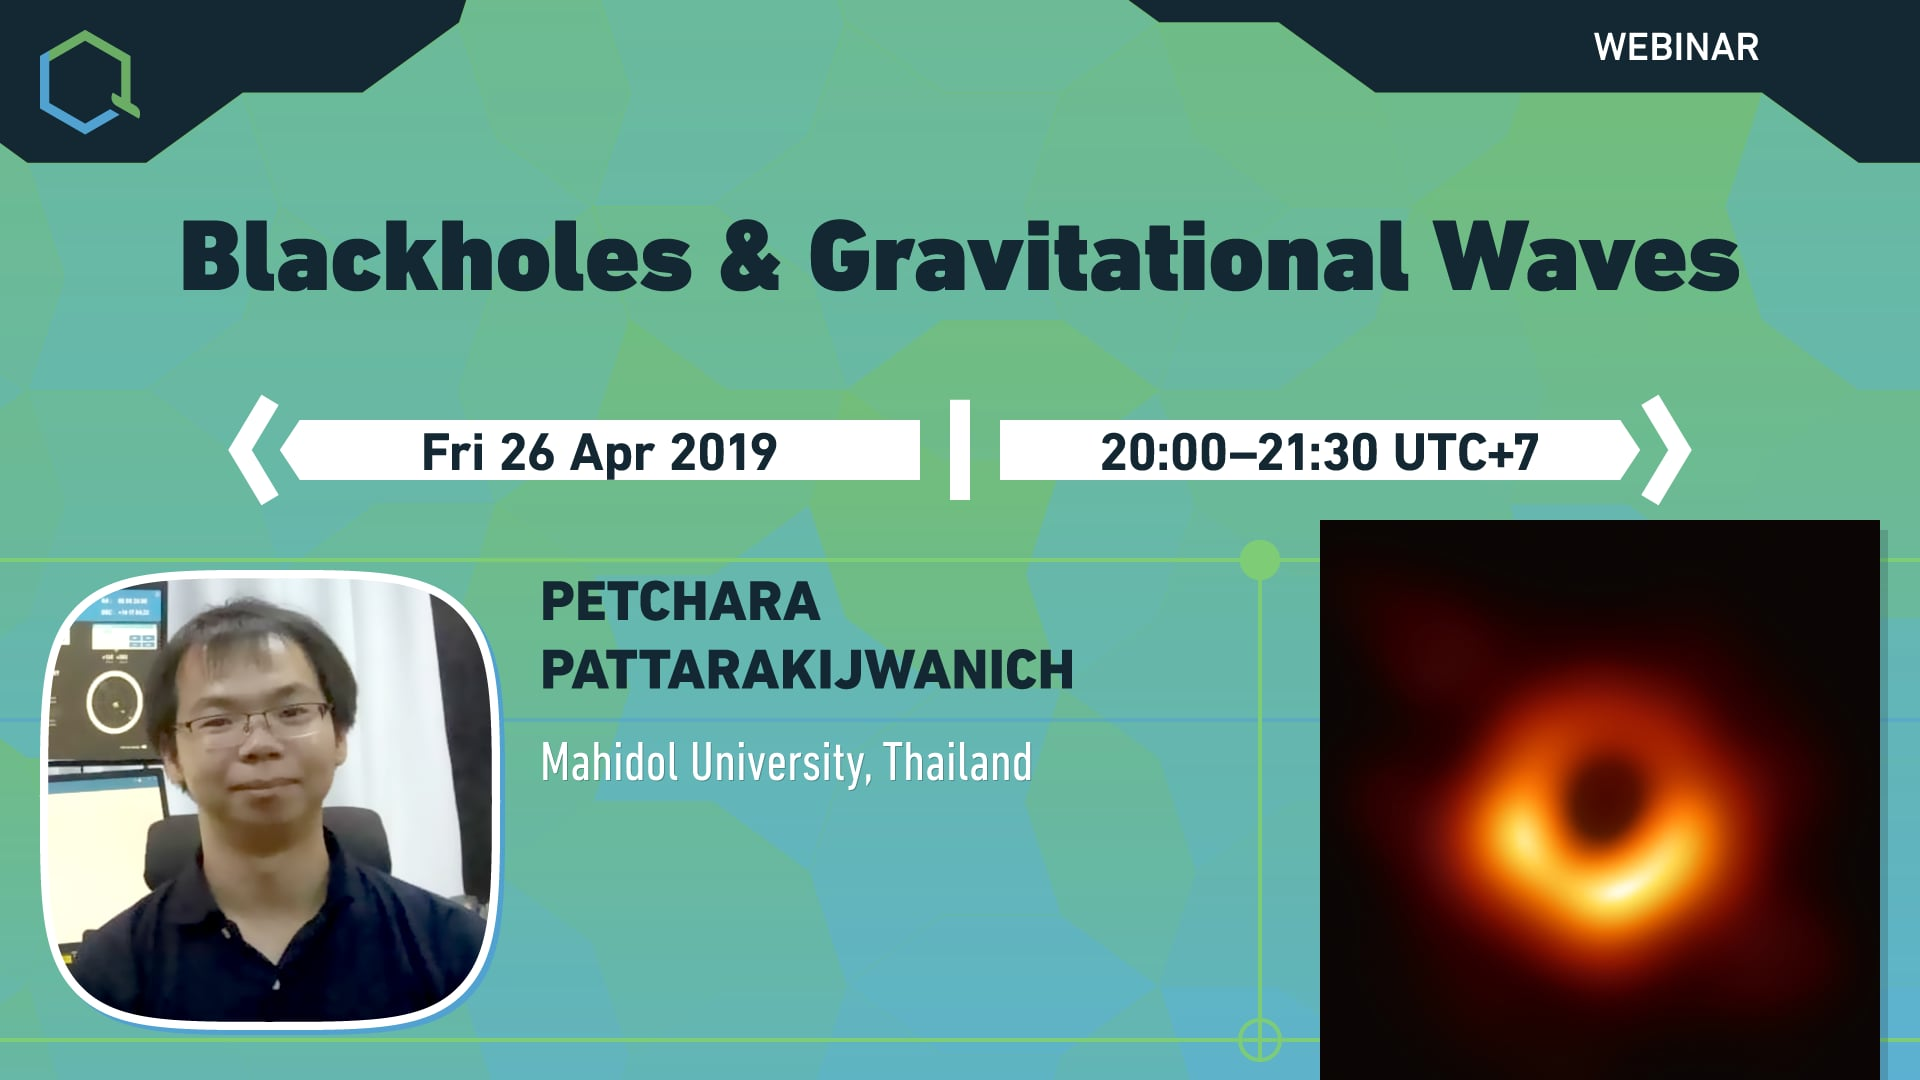 Blackholes and Gravitational Waves